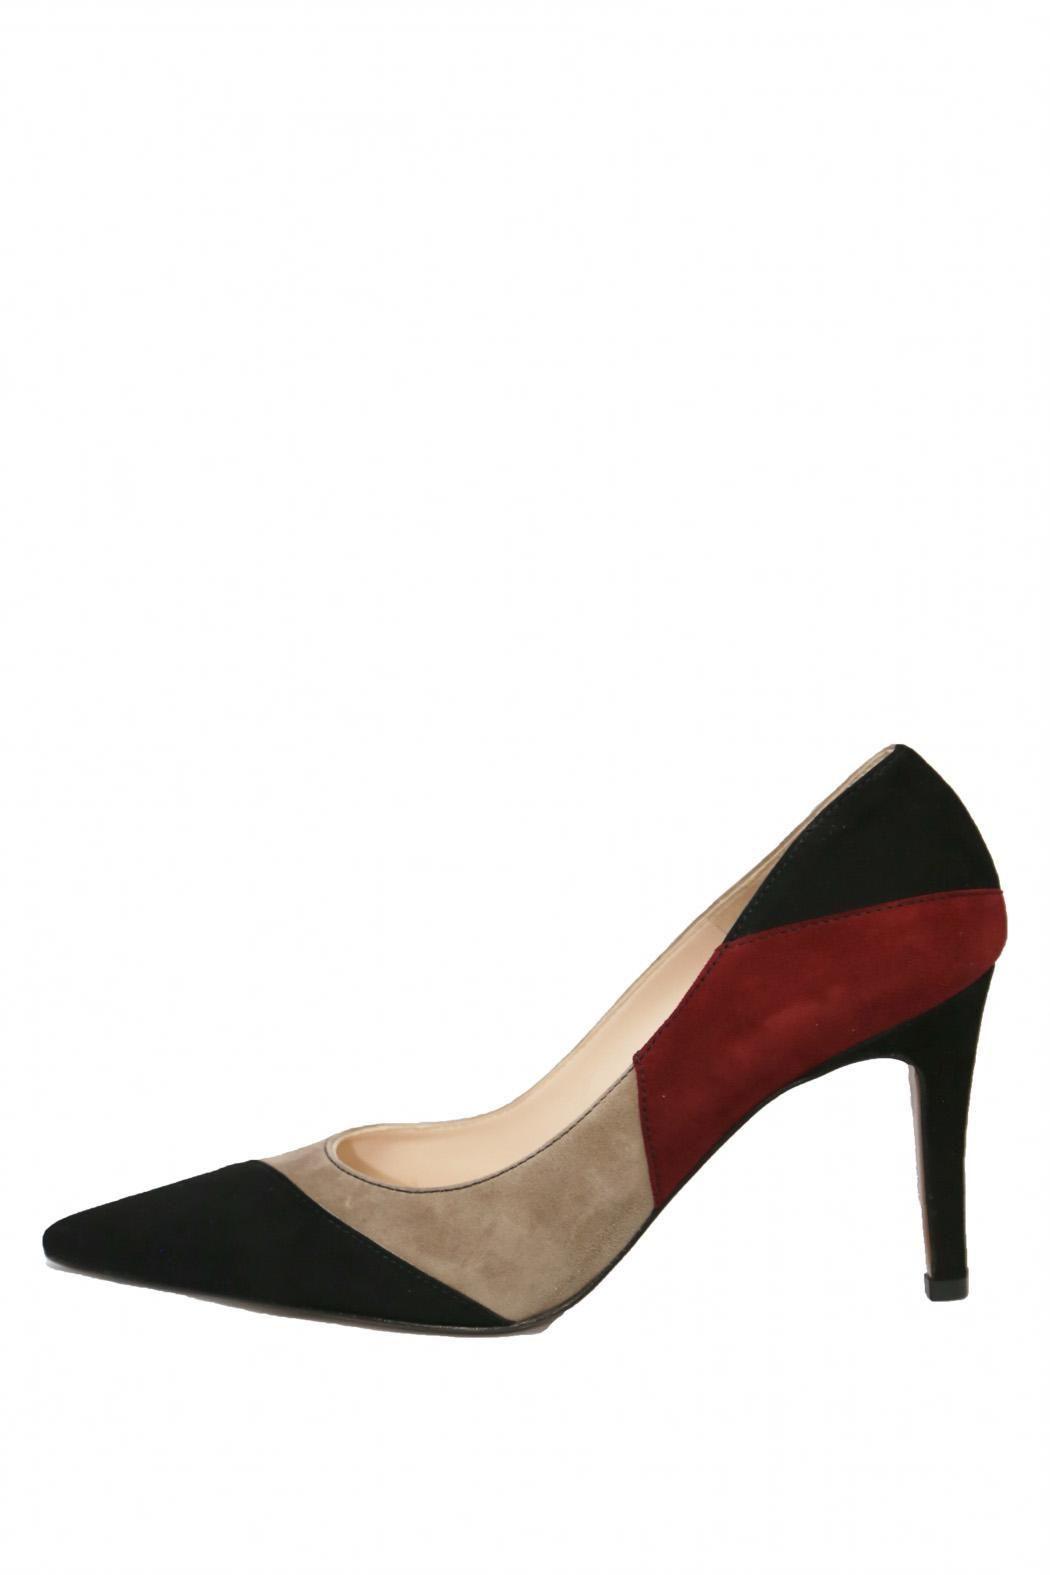 Dressy Black Heel Heels Black Heels Shoes Heels Pumps